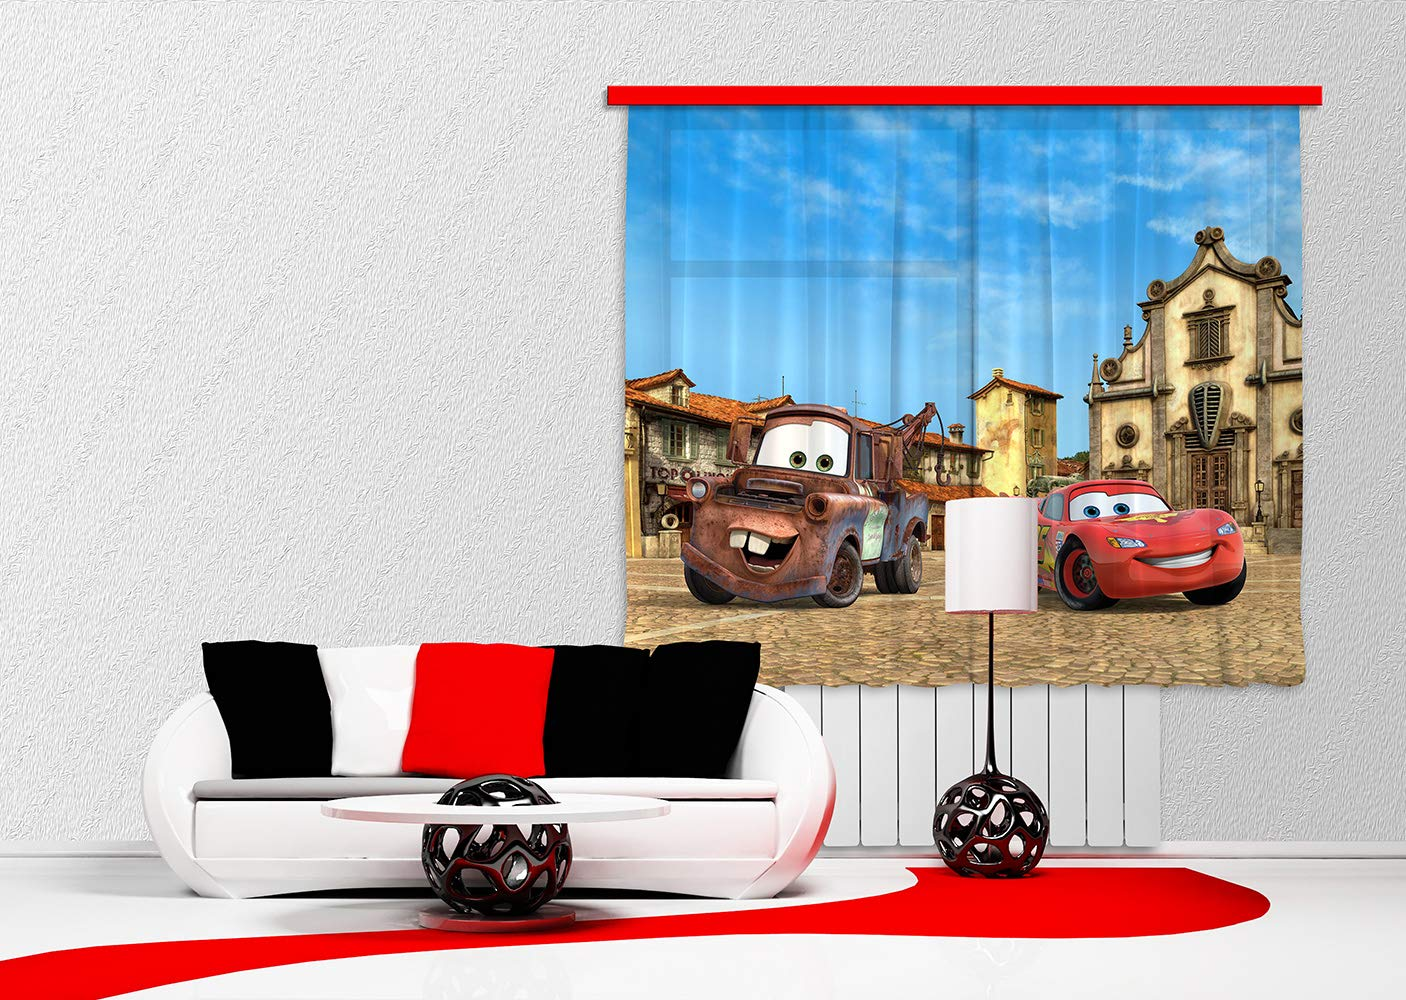 AG Design FCS xl 4315 dise/ño de CARS Cortinas para habitaci/ón infantil